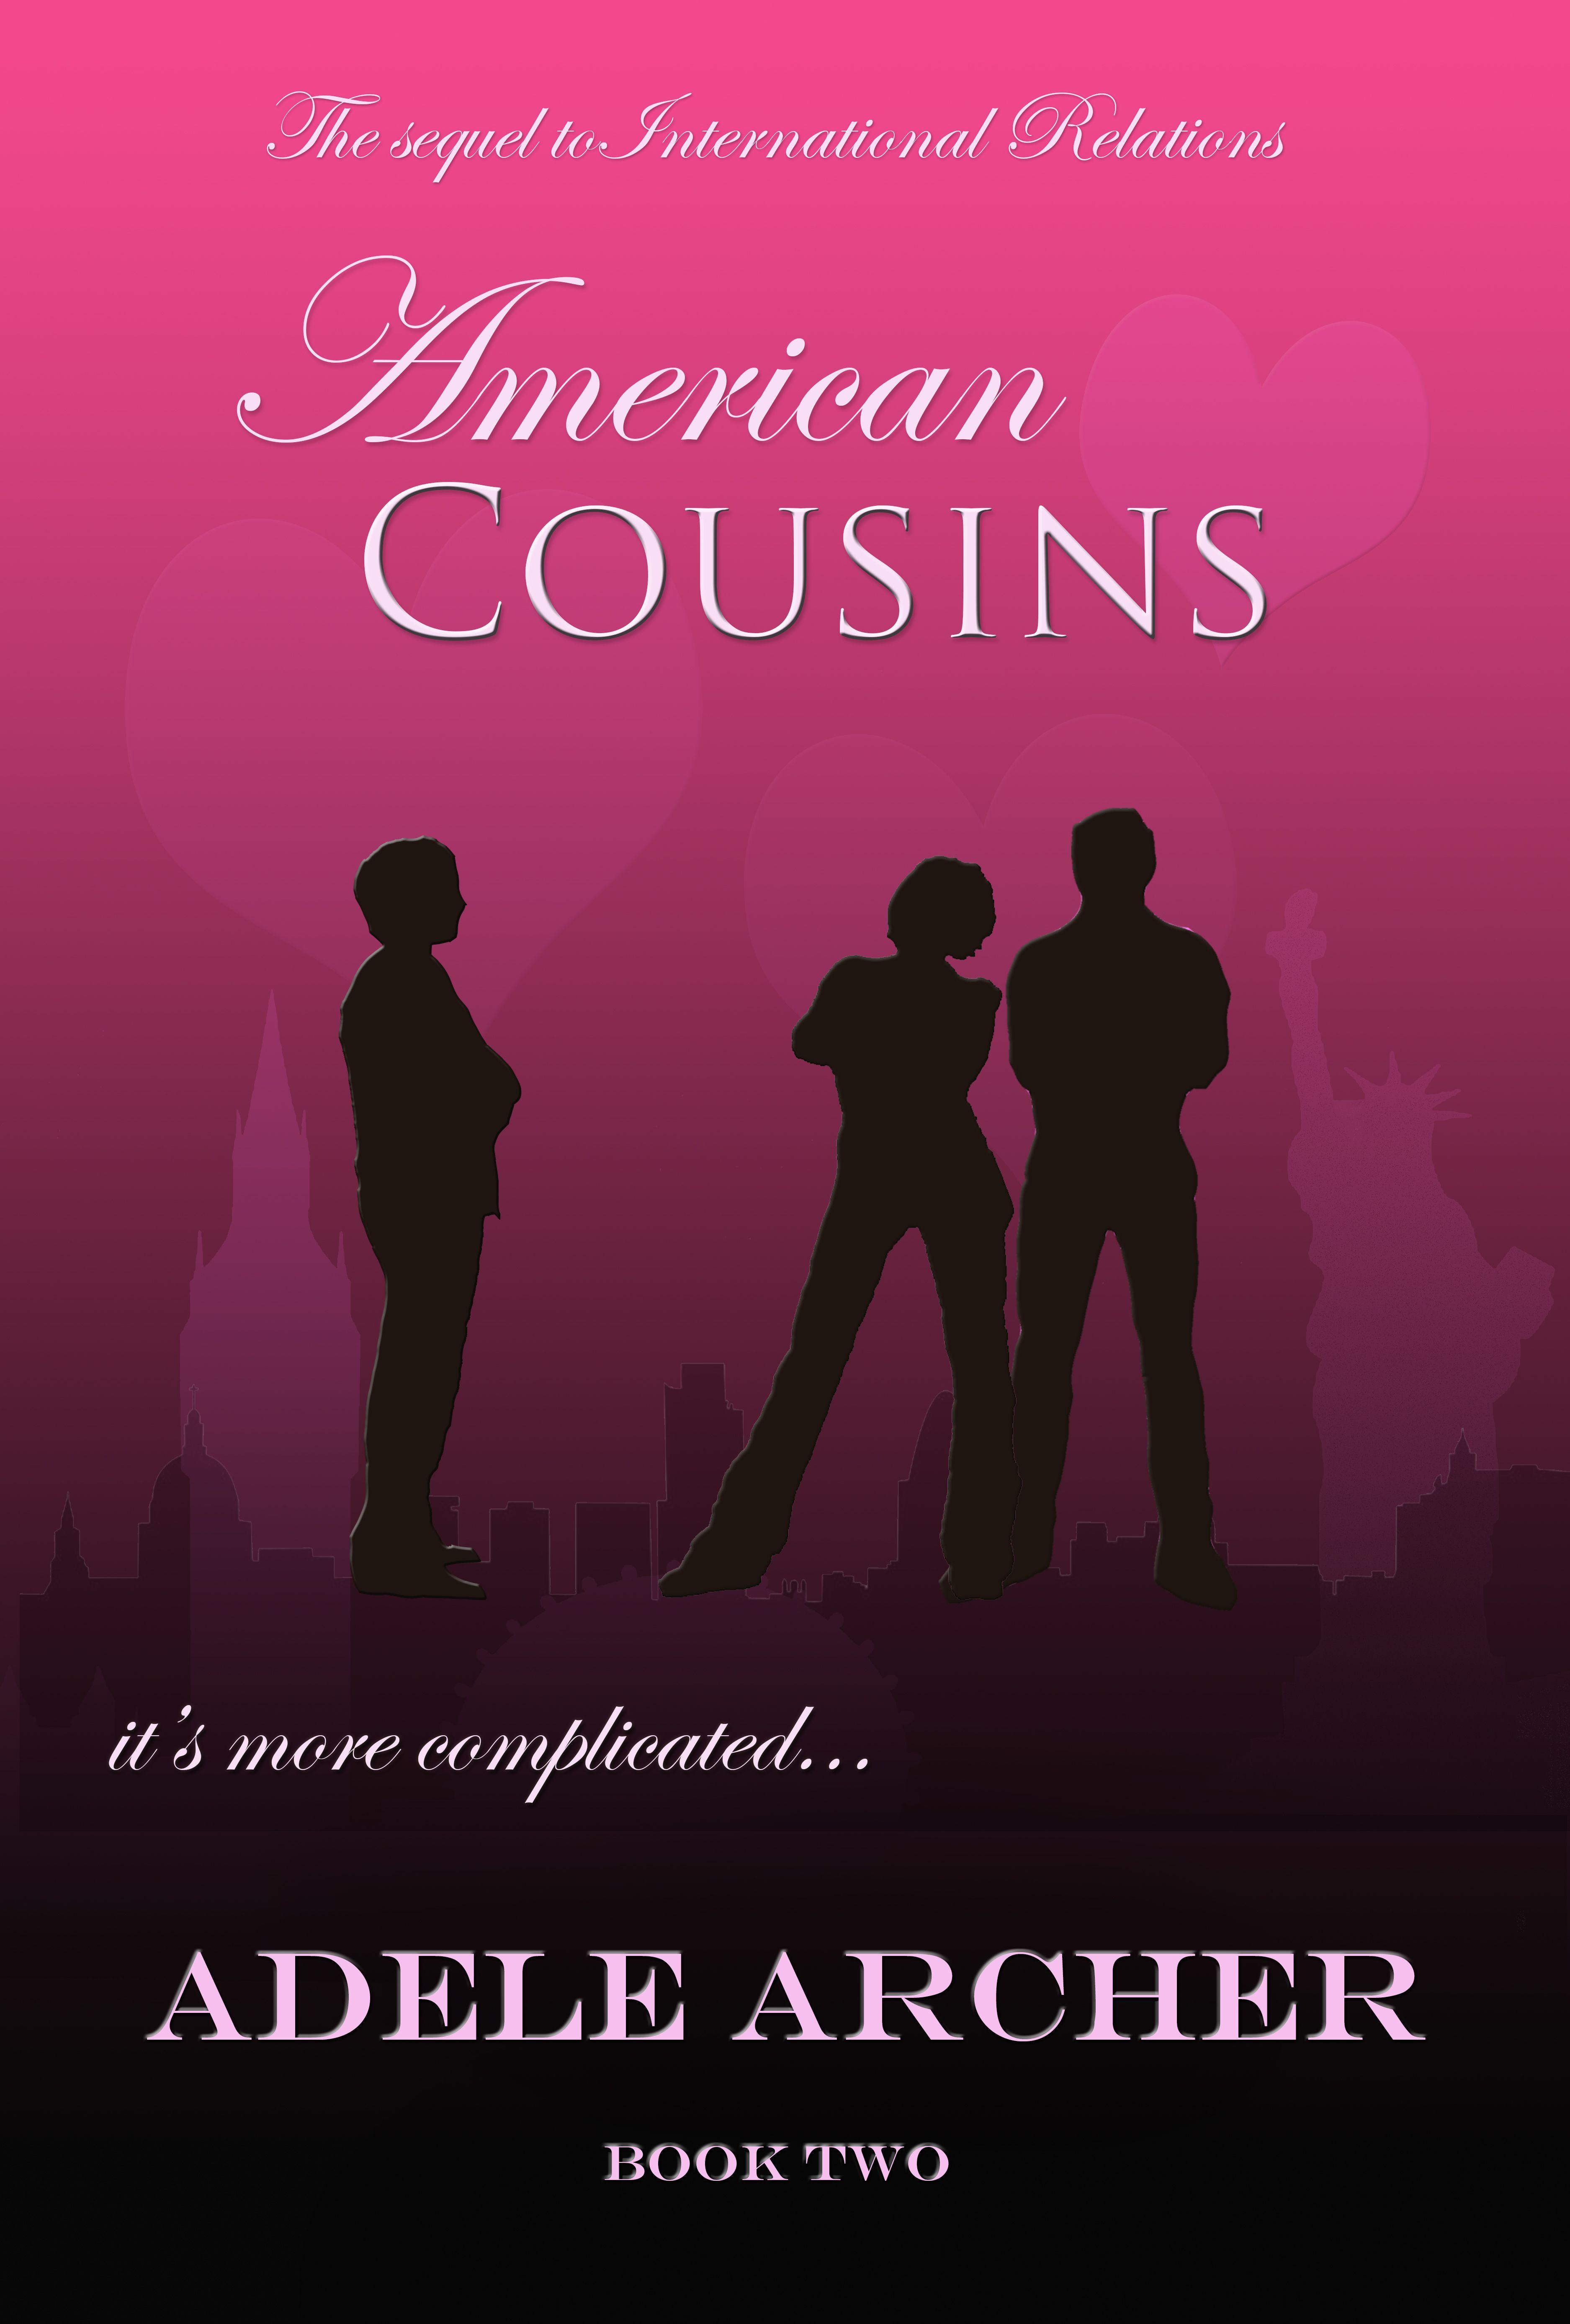 American Cousins book cover httpswwwamazoncoukAmericanCousinsInternationalRelationsII